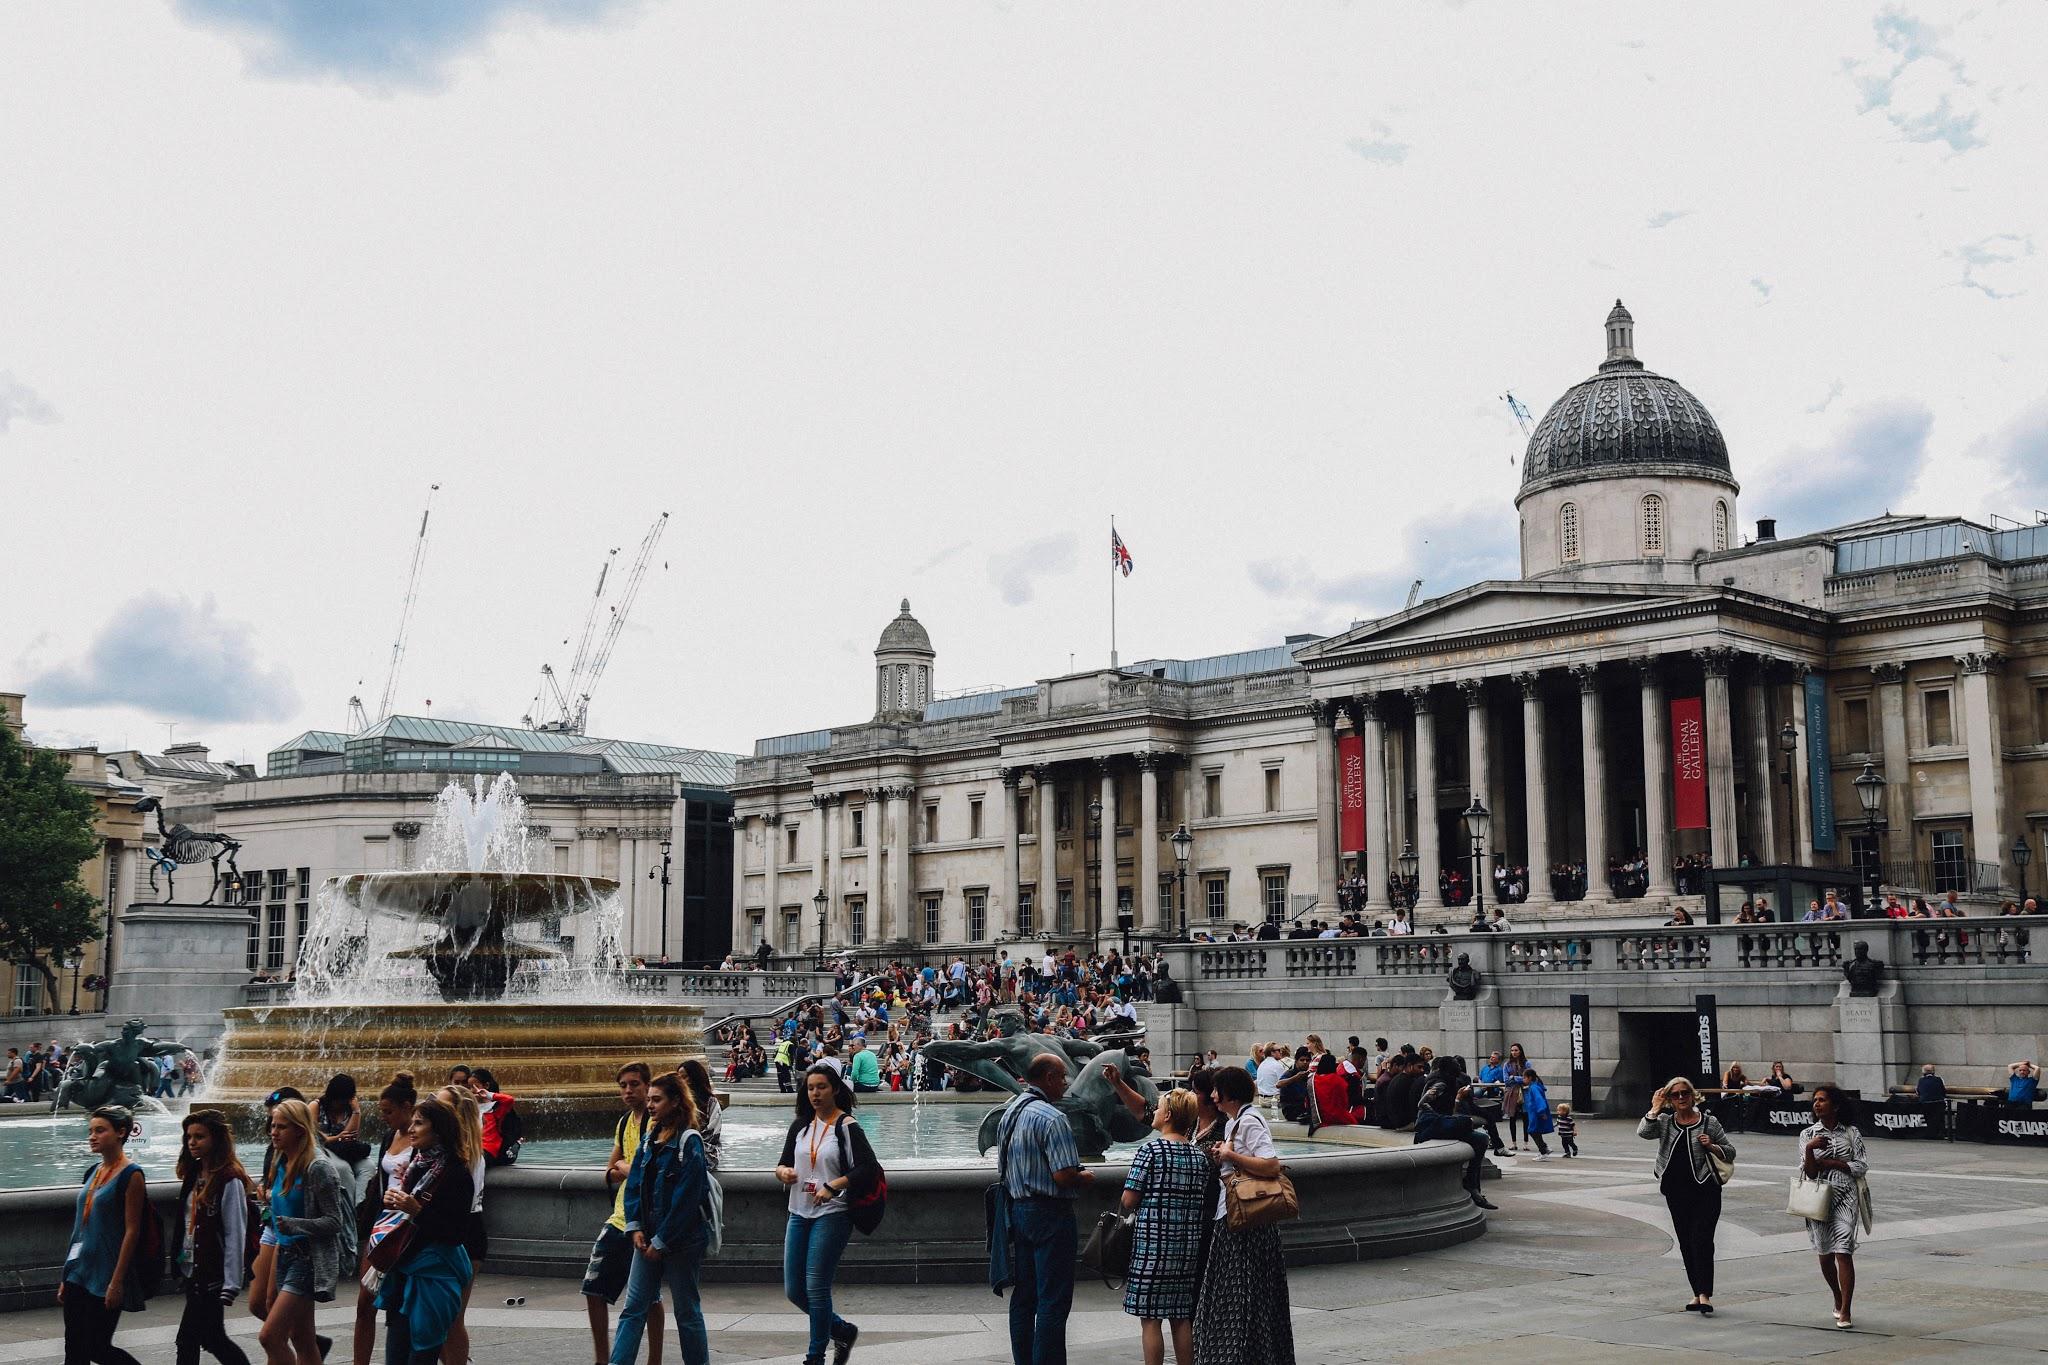 London City Walking Tour Guide